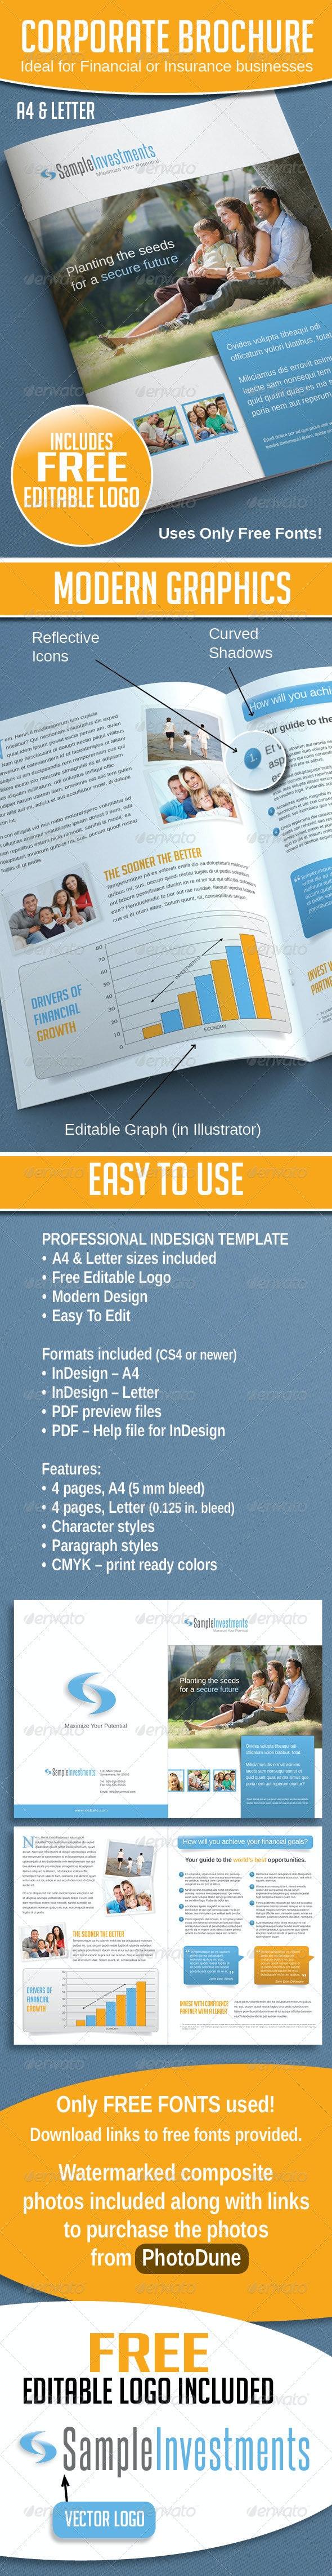 Corporate Brochure - Brochures Print Templates